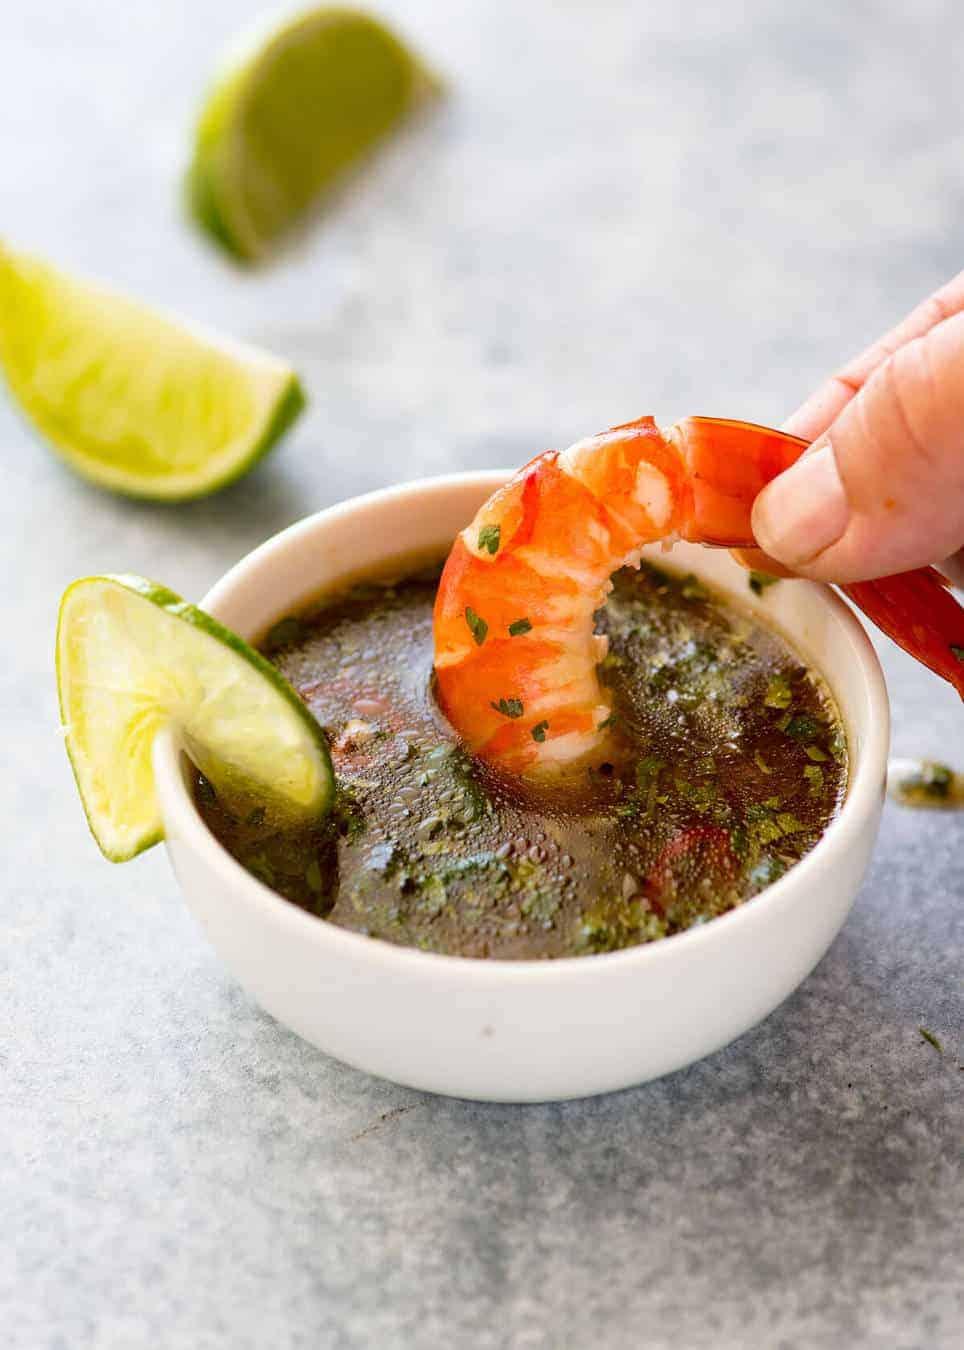 Thai Sweet Chilli Lime Sauce for Prawns (Shrimp) www.recipetineats.com